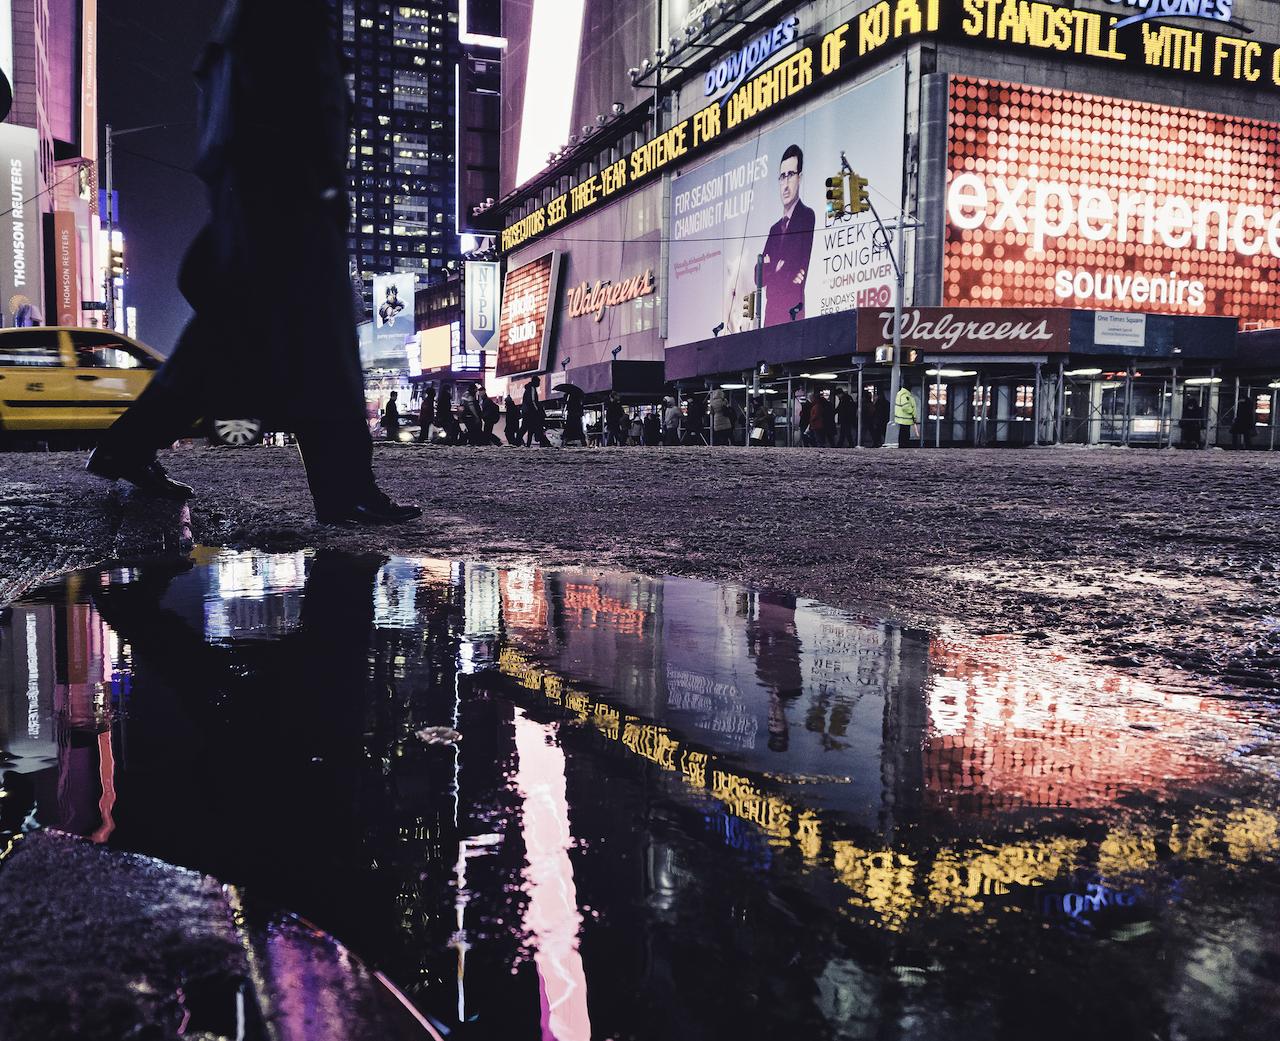 Man crossing the slushy street during the winter in New York City, USA